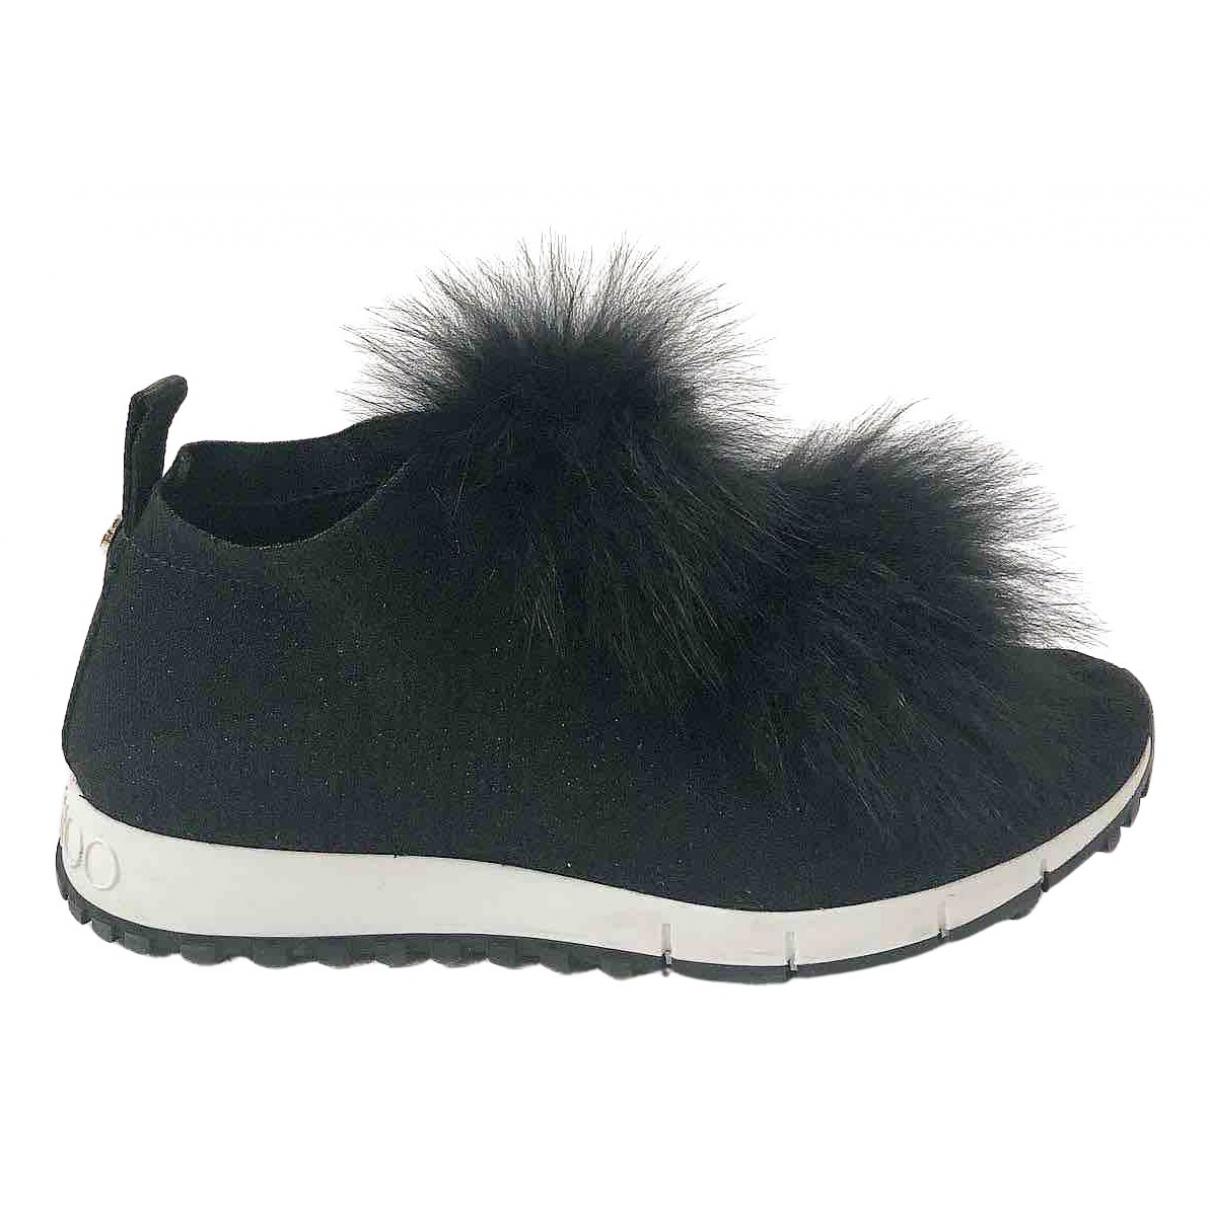 Jimmy Choo \N Sneakers in  Schwarz Fuchs